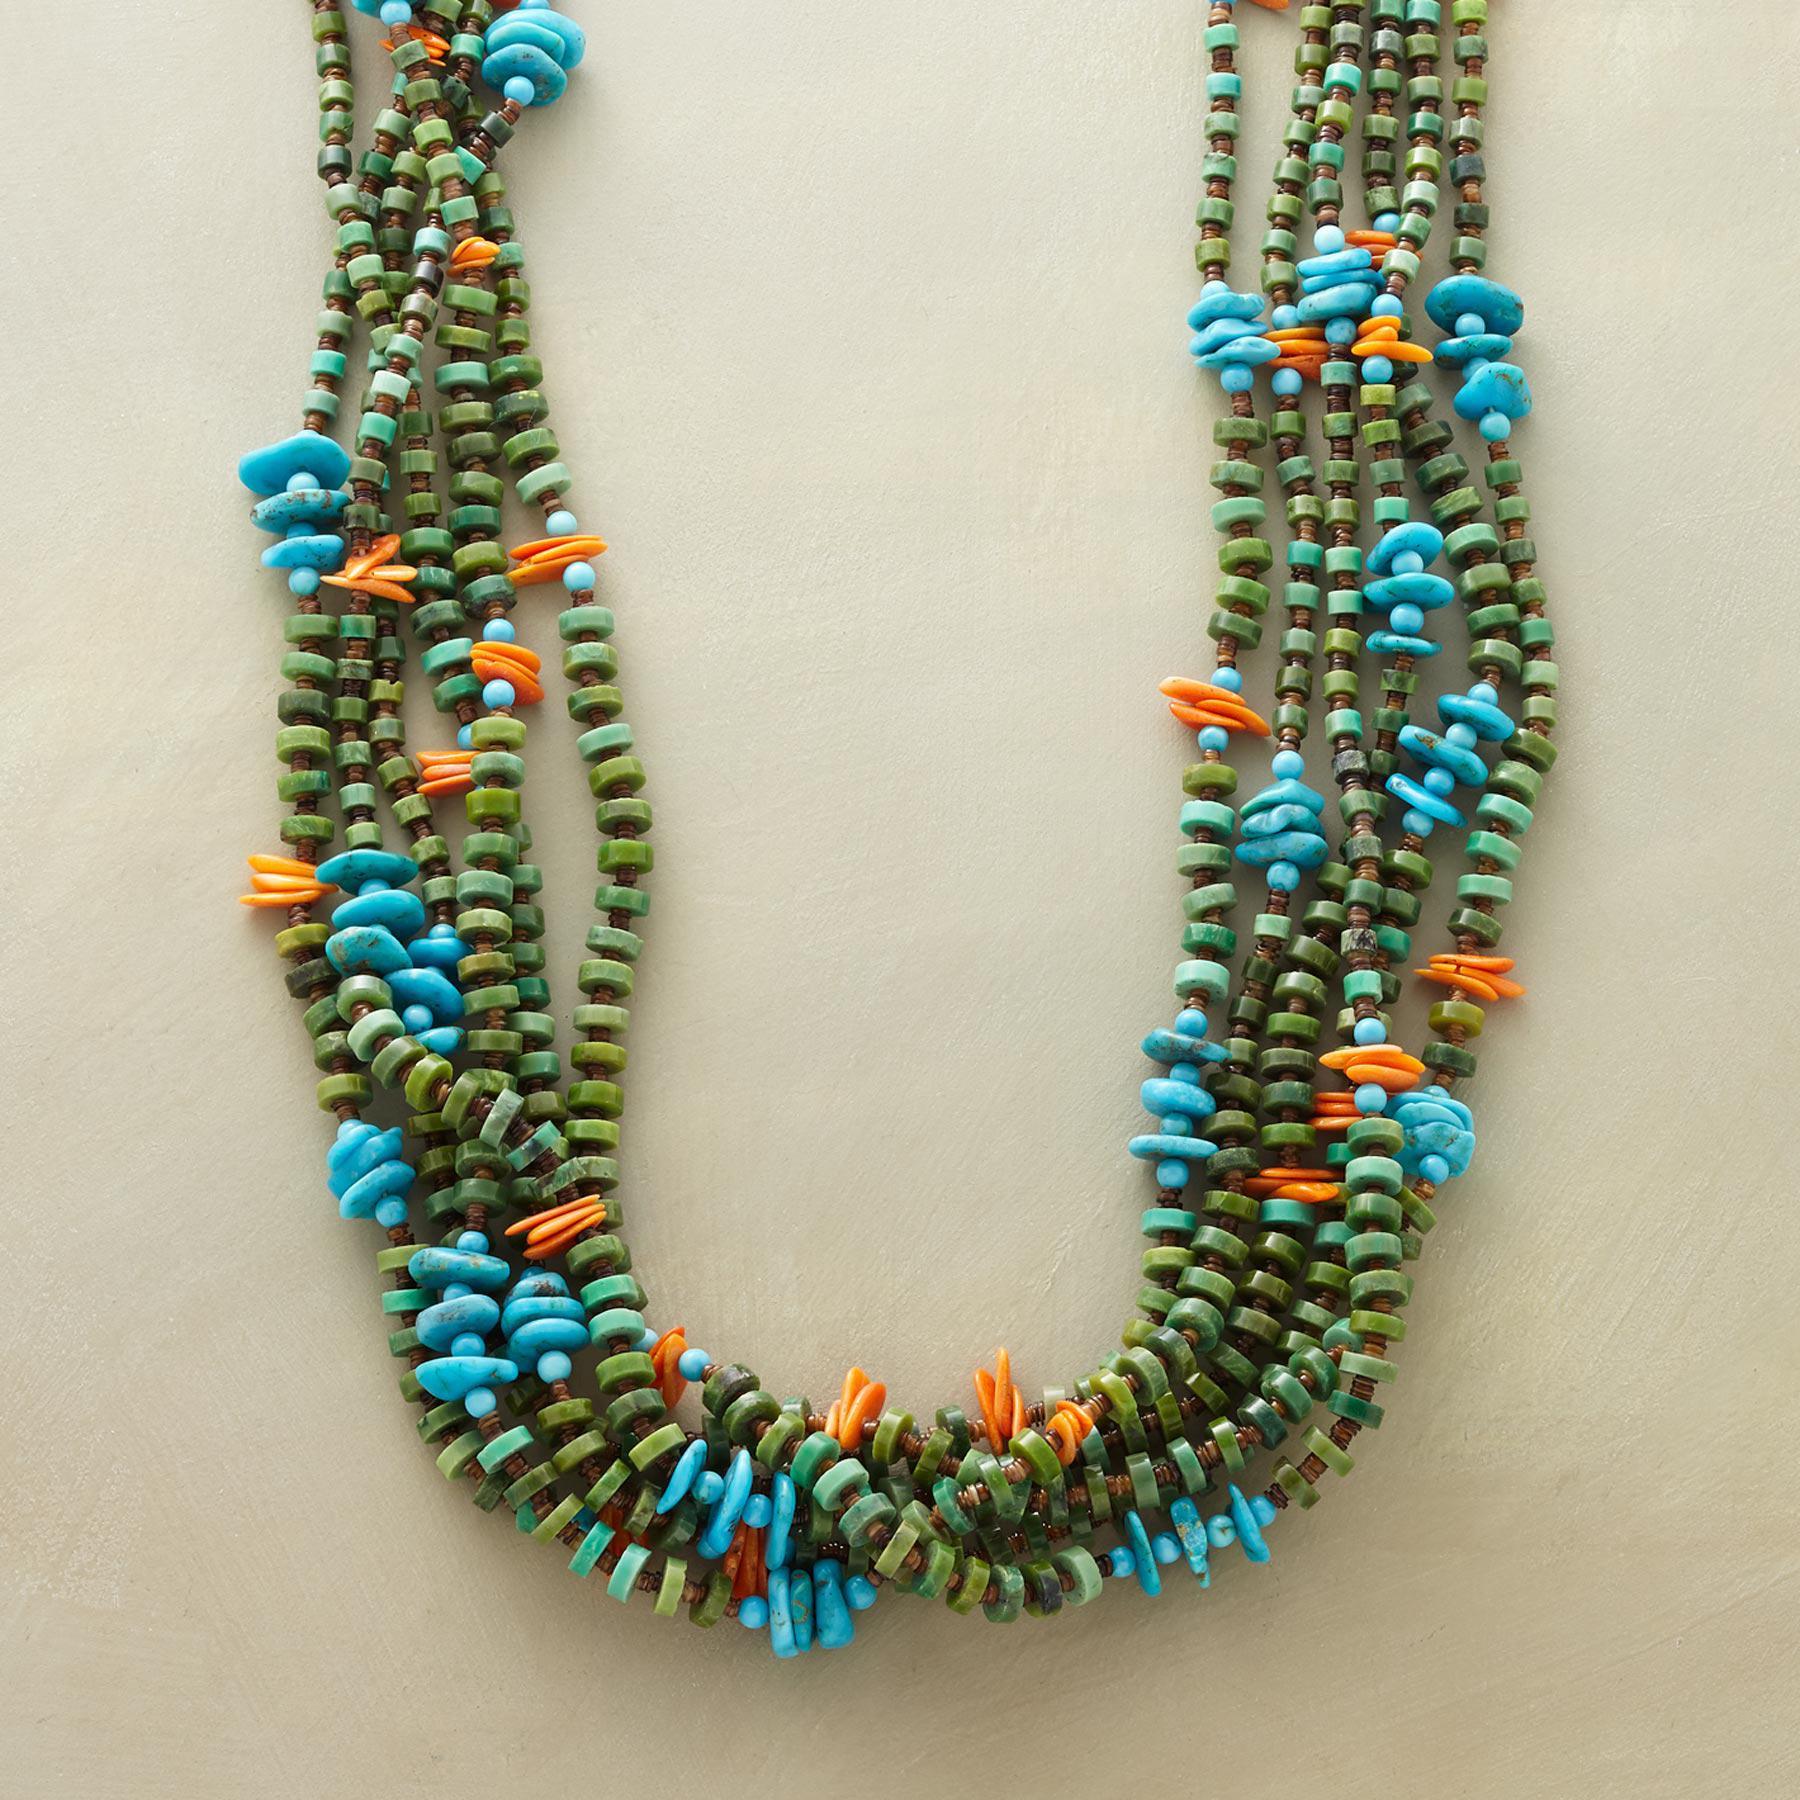 Turquoise Santo Domingo Pueblo Necklace